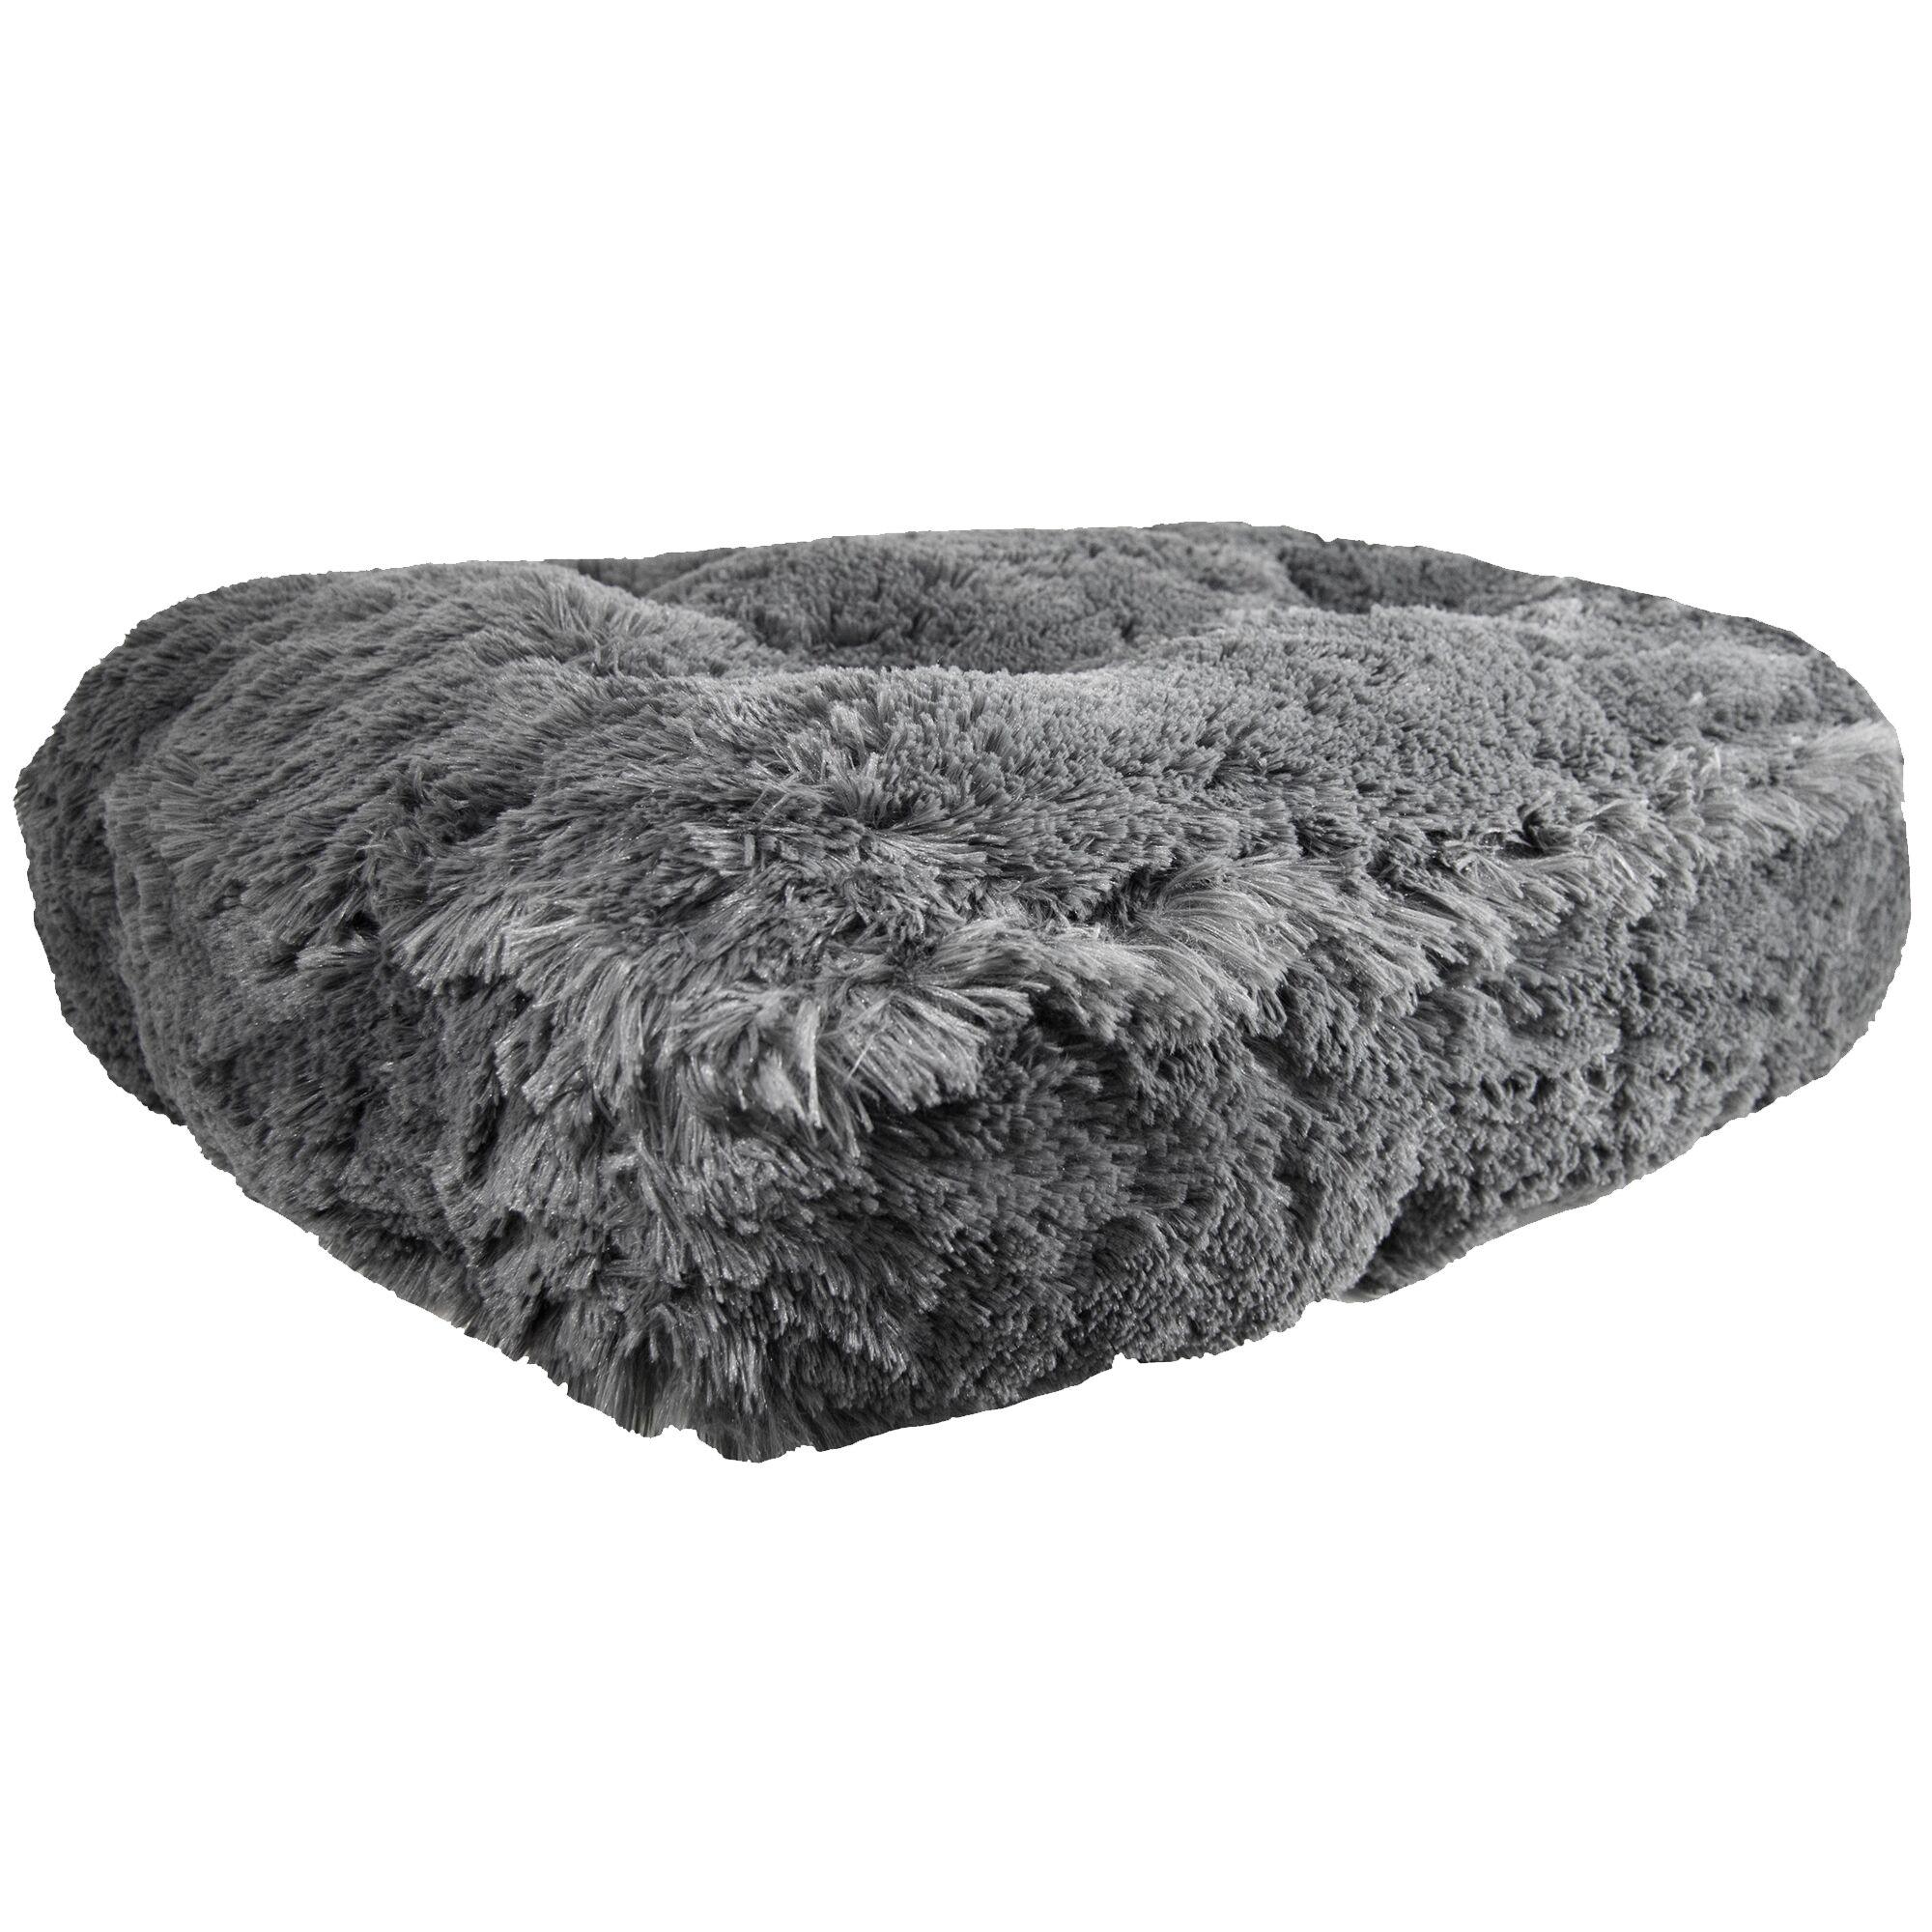 Aparicio Rectangle Dog Pillow Size: Large (46